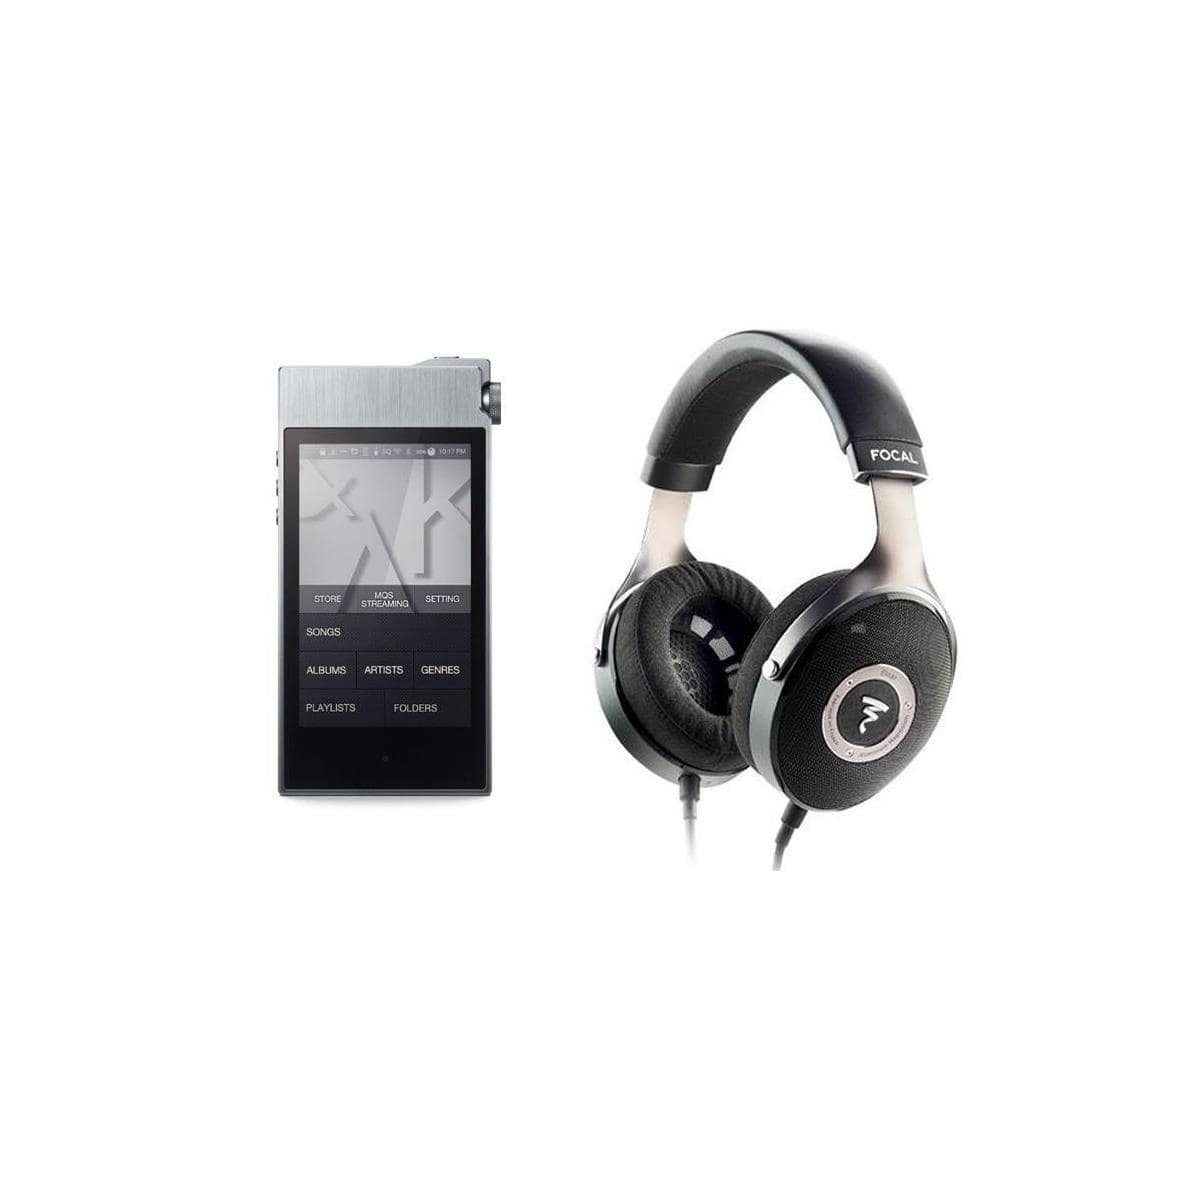 Focal Elear Headphones + Astell&Kern AK100 II Player $1150 or  Focal Utopia Headphones + iFi Pro iCan Amp +  AK100 II Player $4000 + free shipping